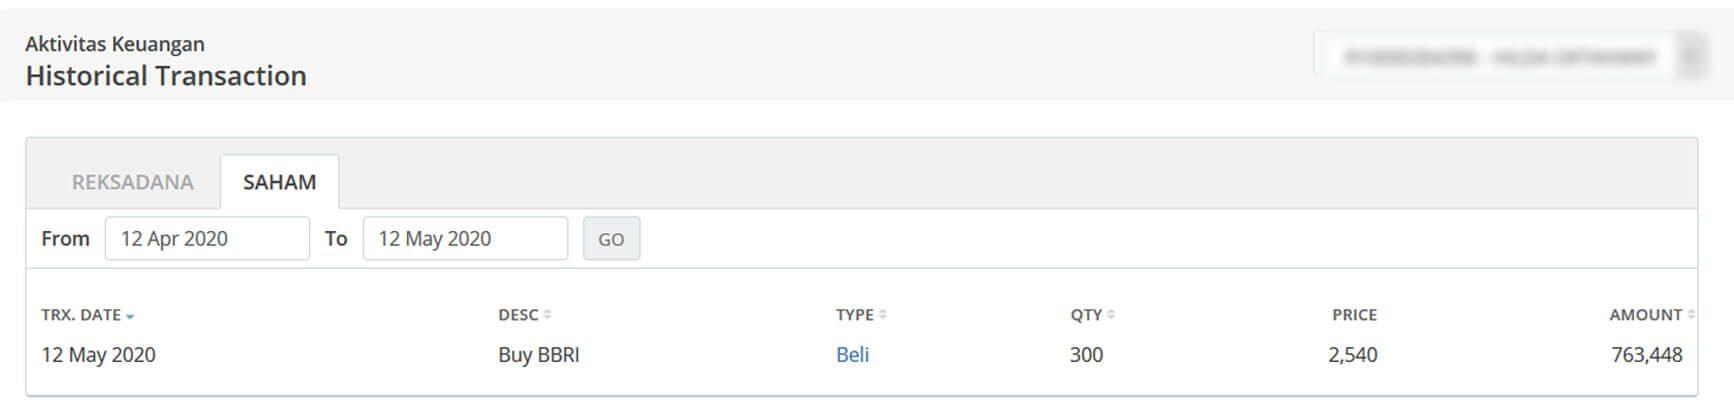 Screenshot Perkembangan Investasi Saham - Day 96, Selasa, 12 Mei 2020 Pembelian Saham